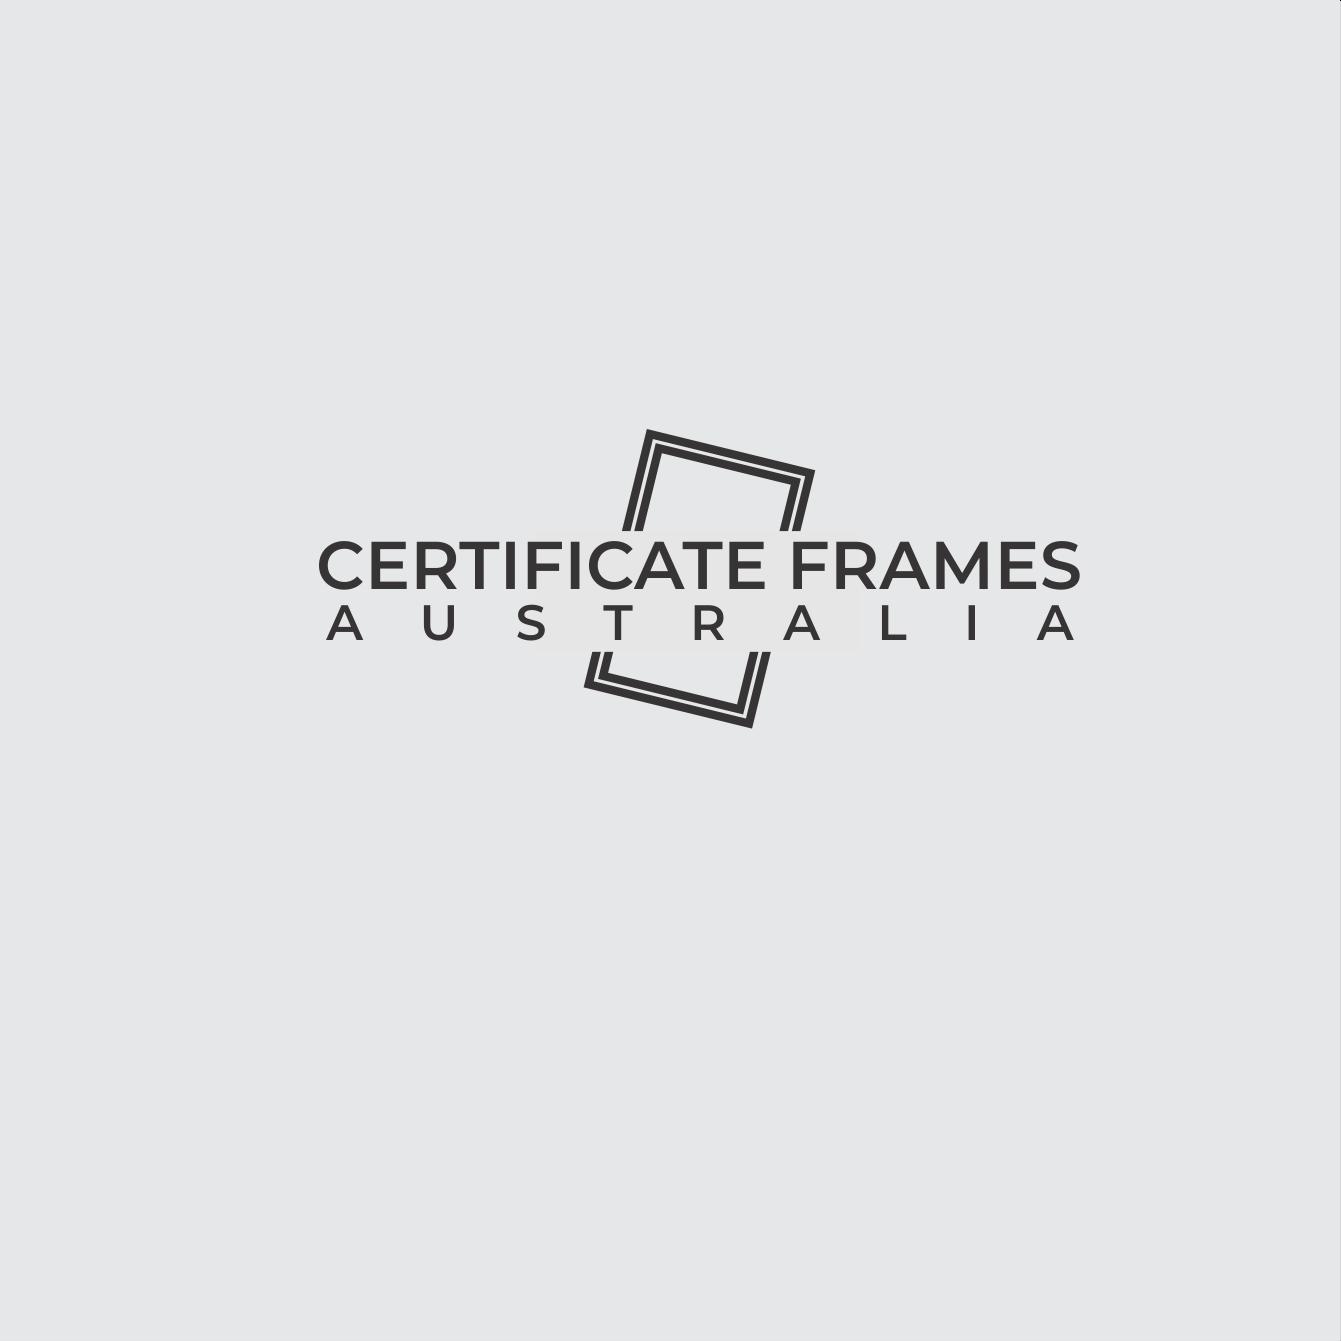 professional serious logo design for certificate frames australia